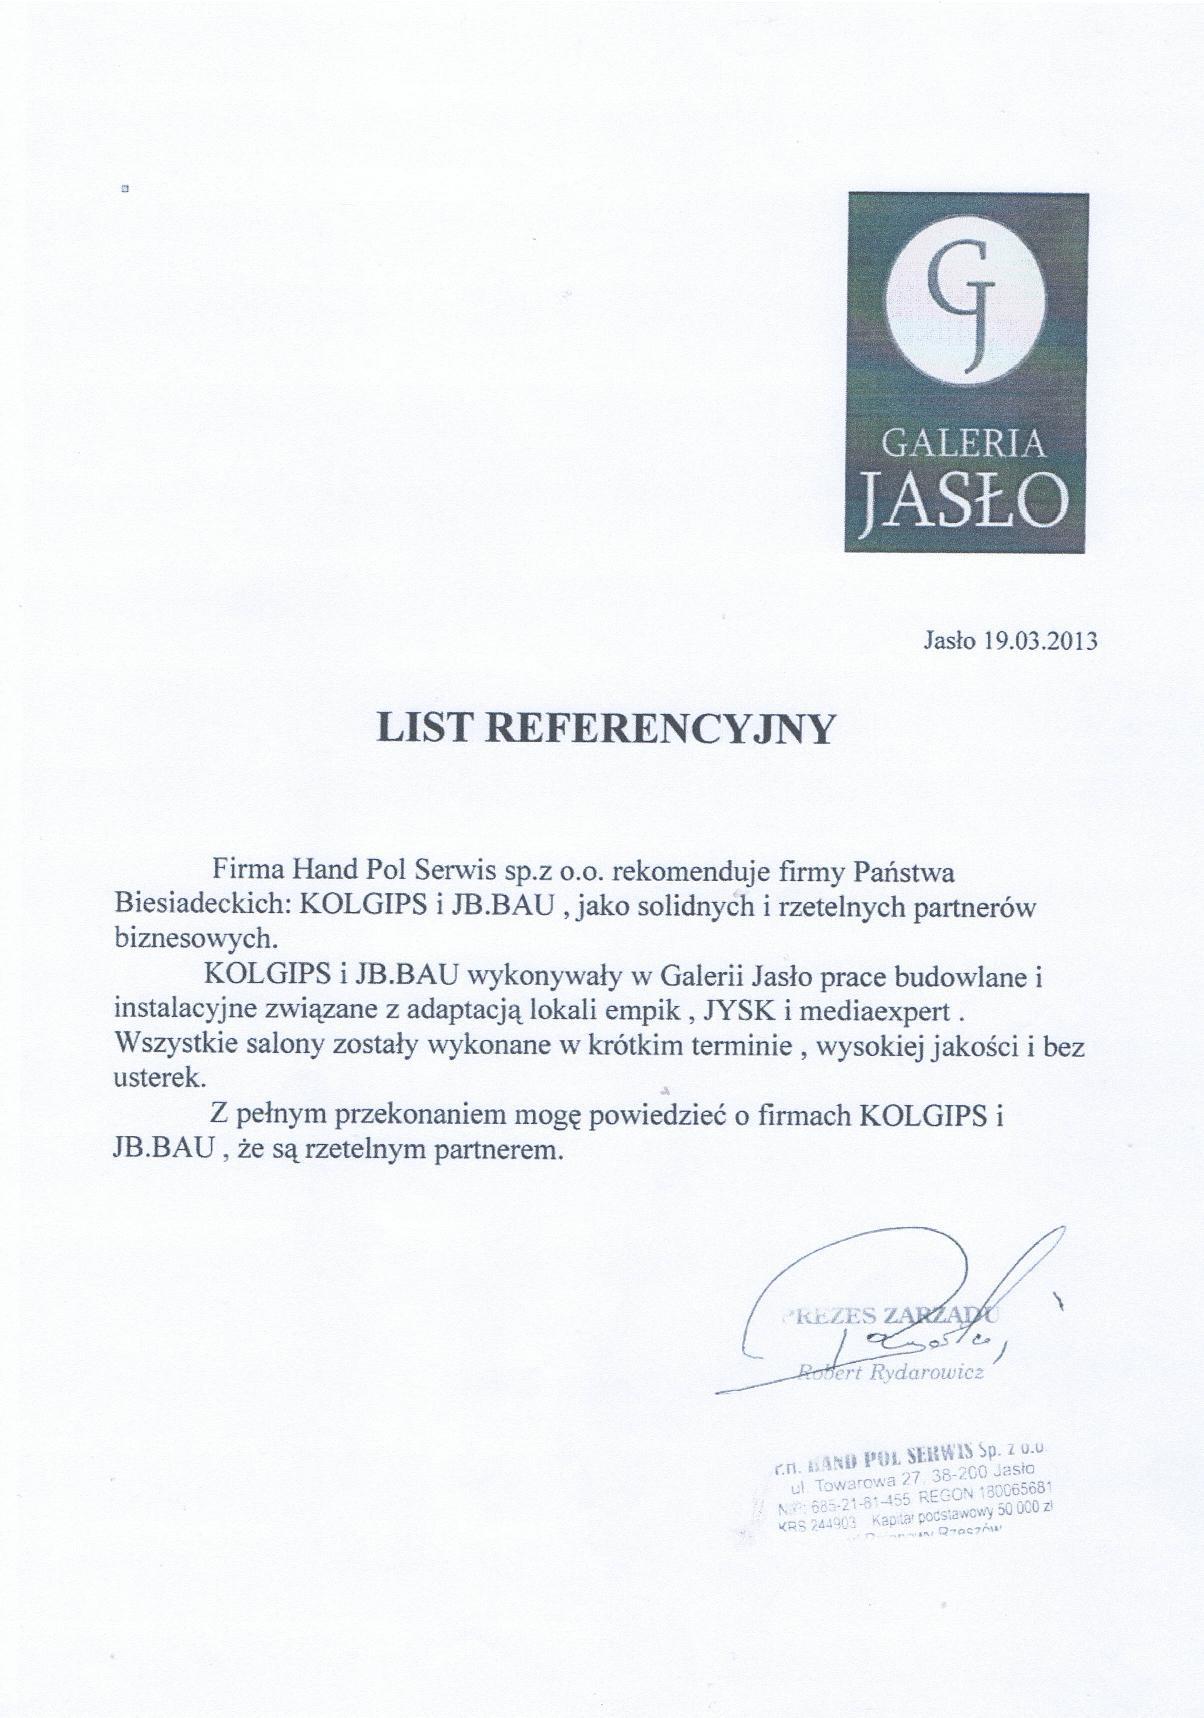 referencje-jaslo